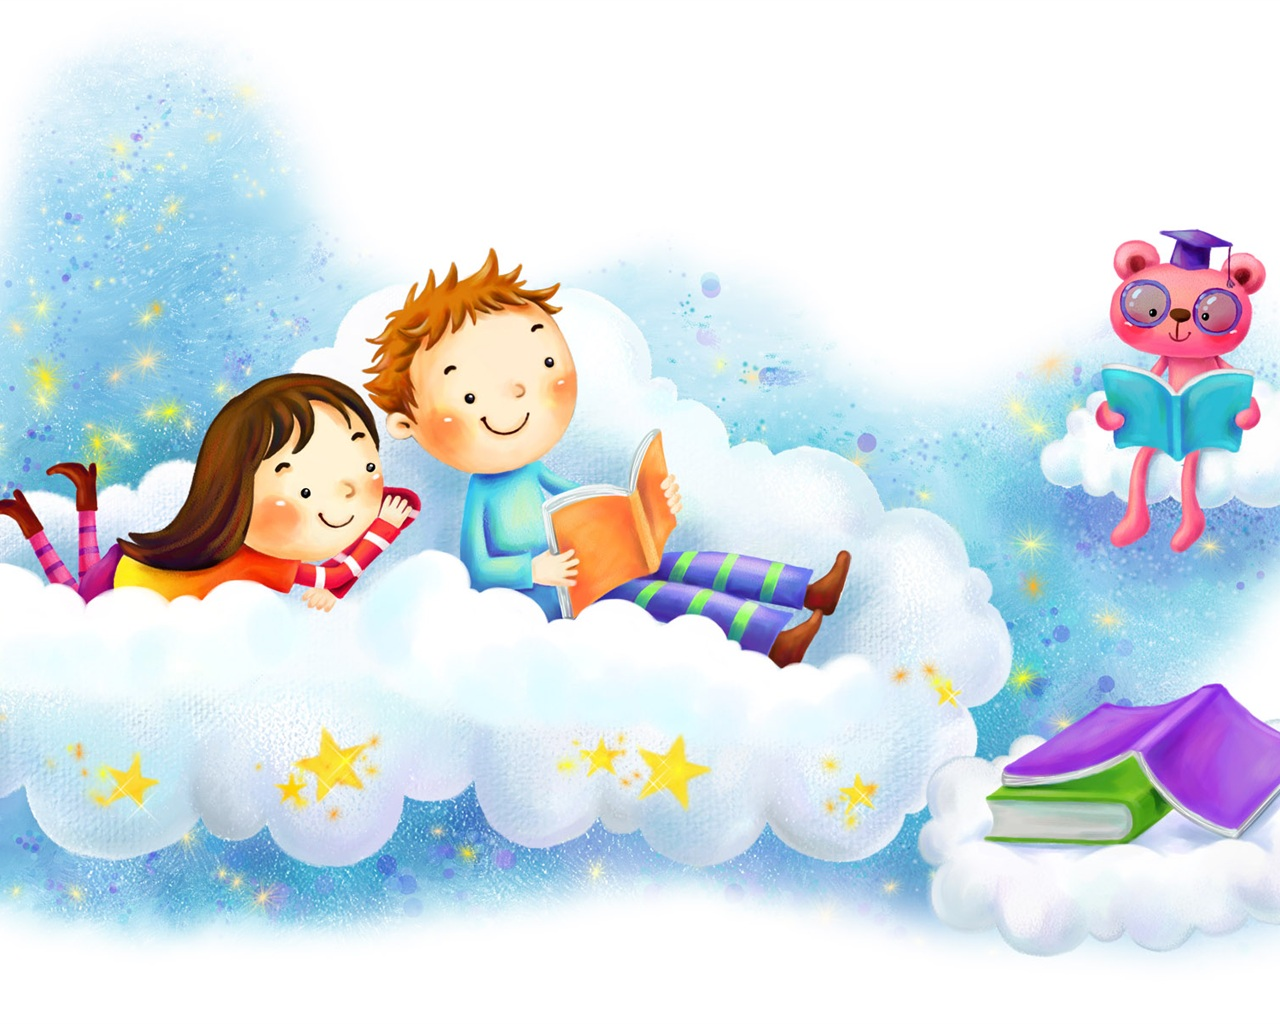 Hd children free wallpaper children s day wallpapers for Childrens wallpaper